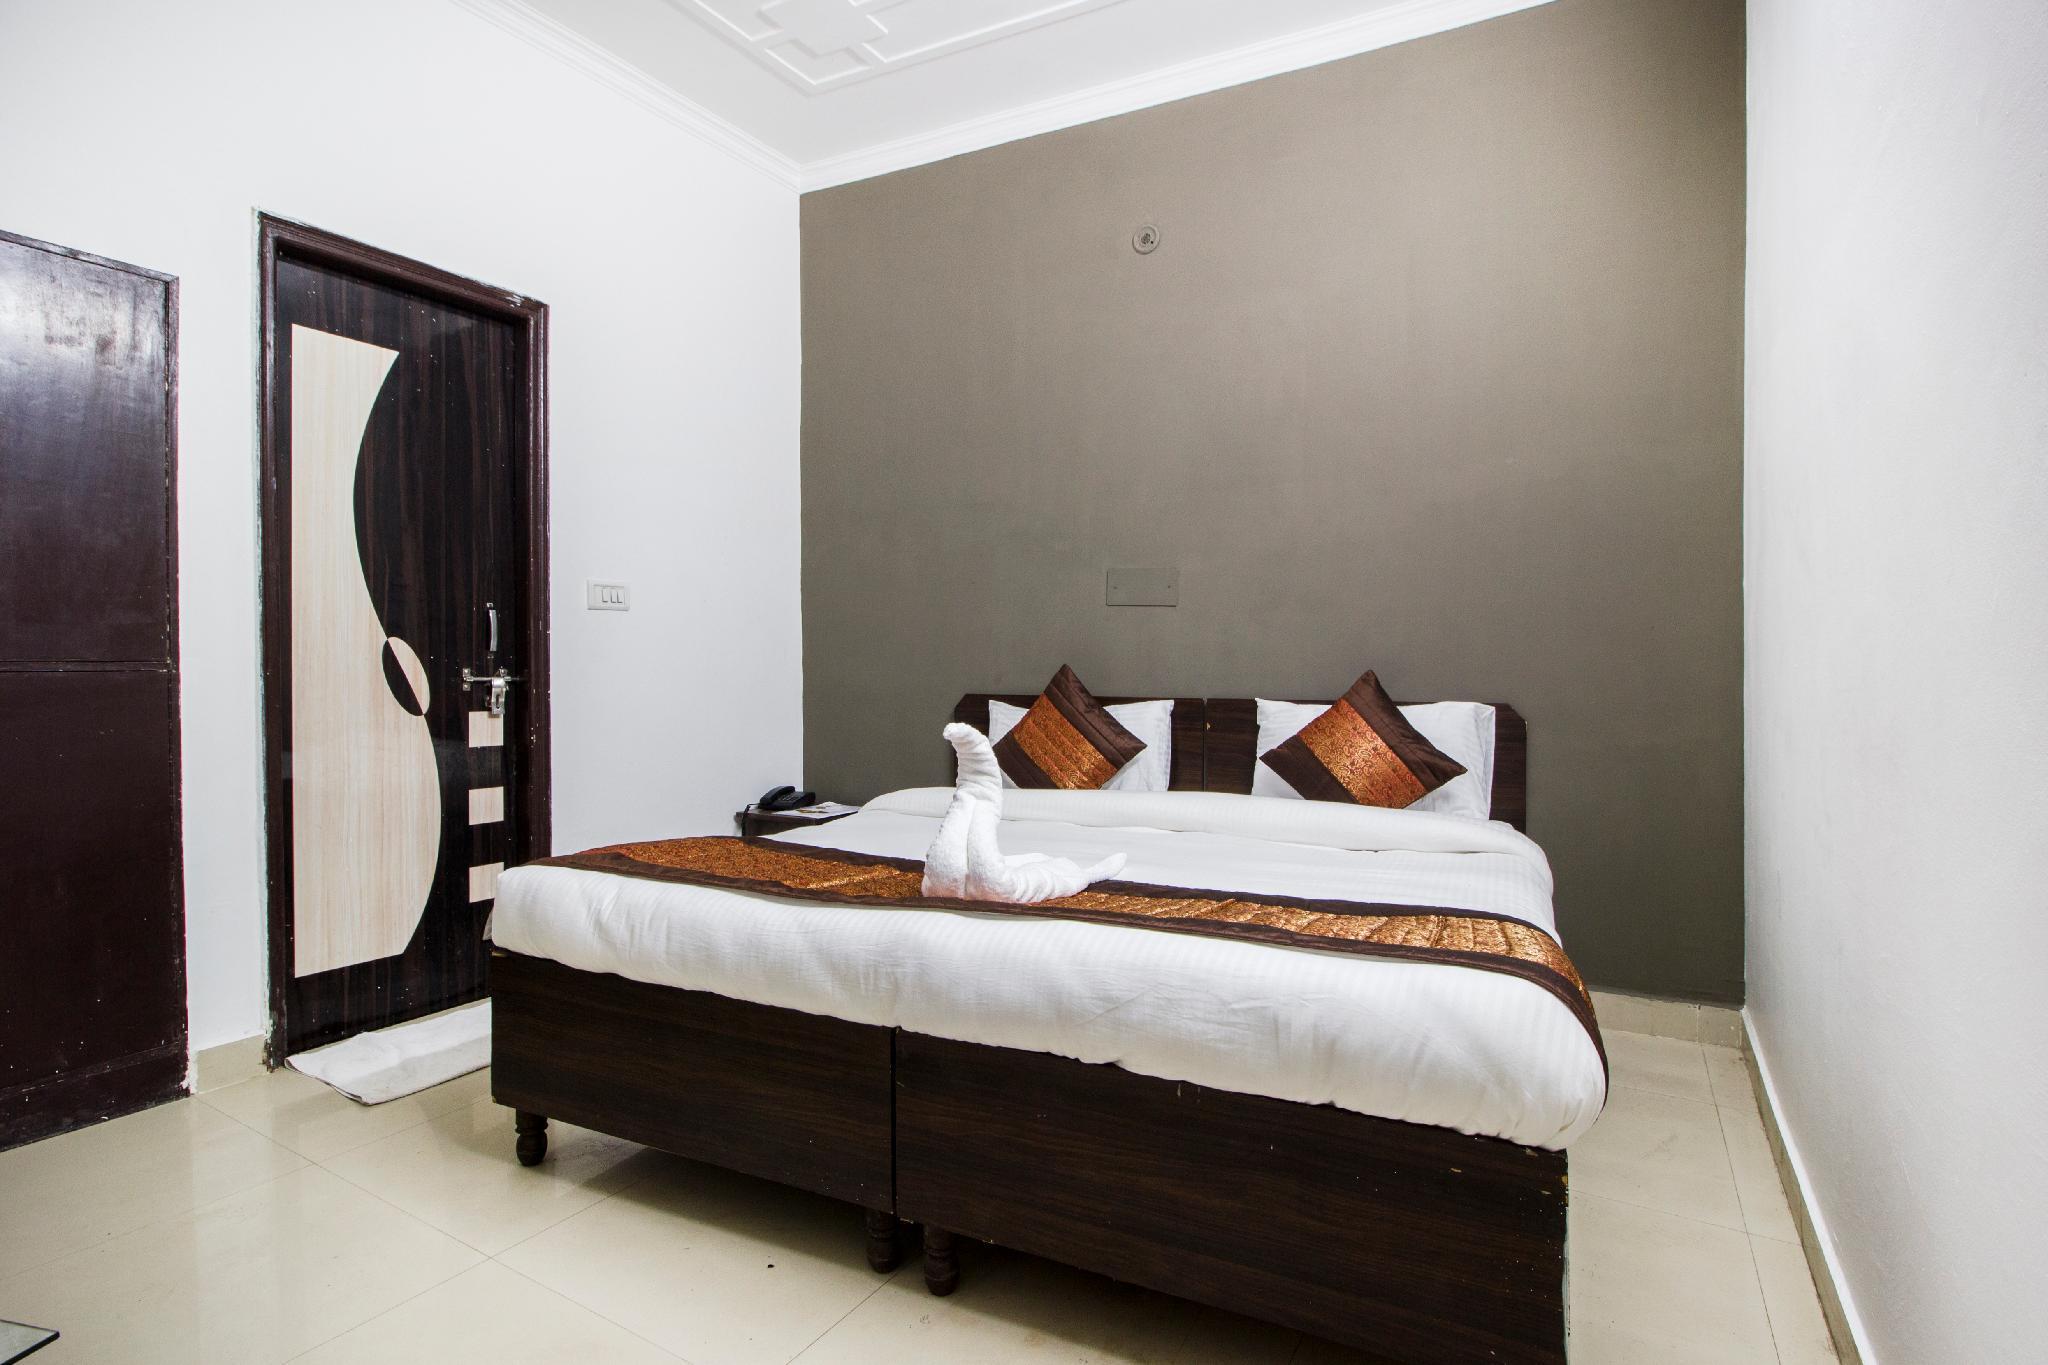 Hotel Stay Villa